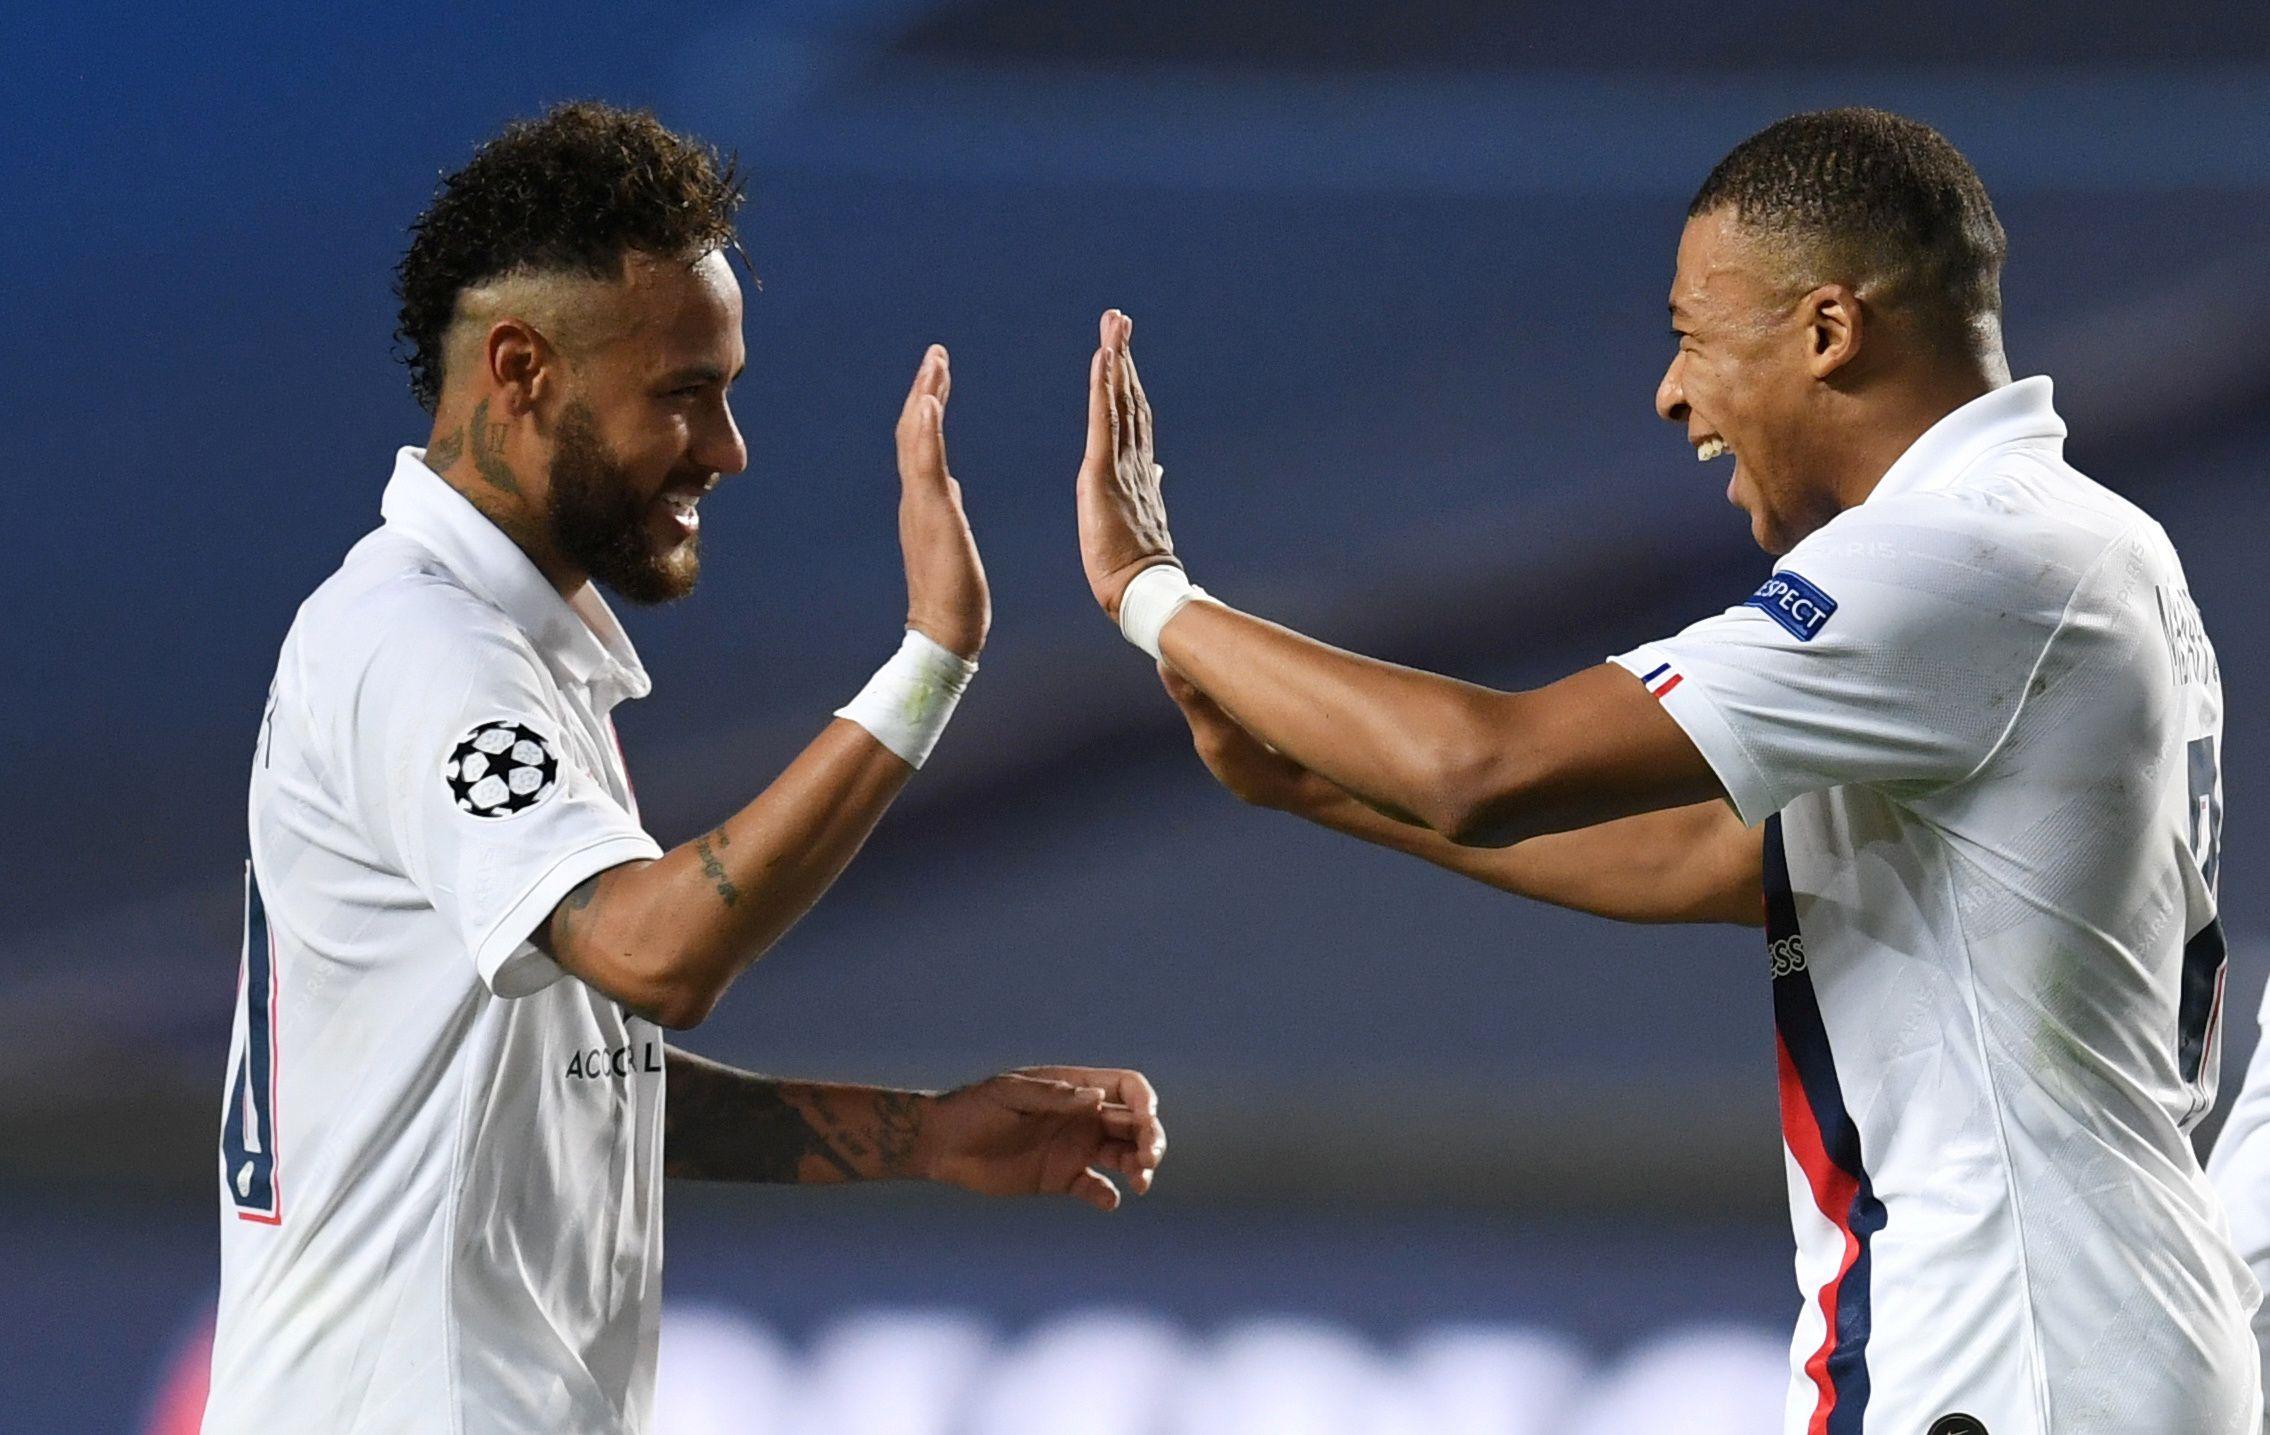 Neymar y Mbappe disputarán las semifinales en Lisboa -Reuters